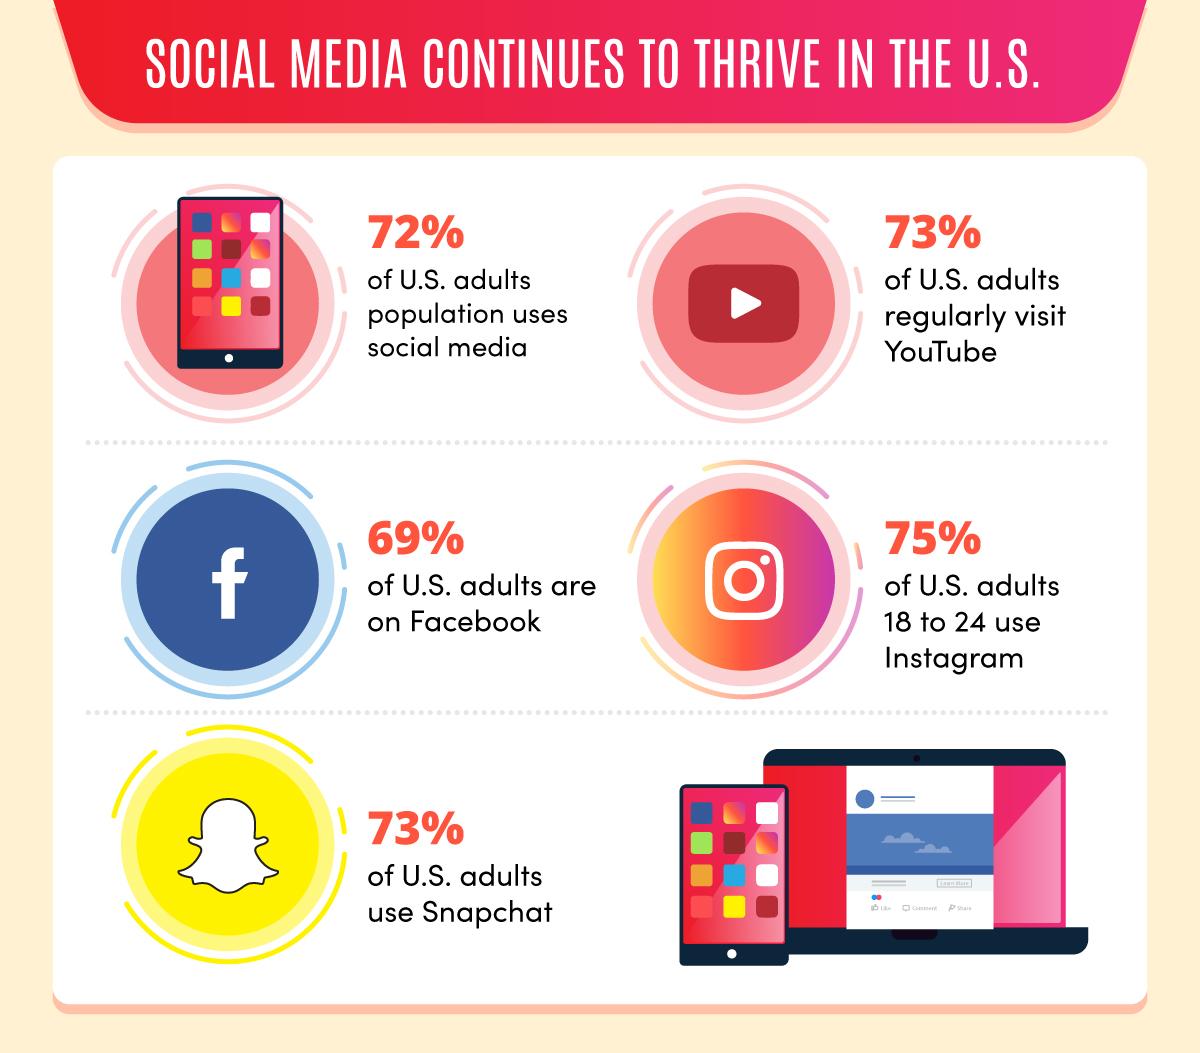 social media statistics and usage